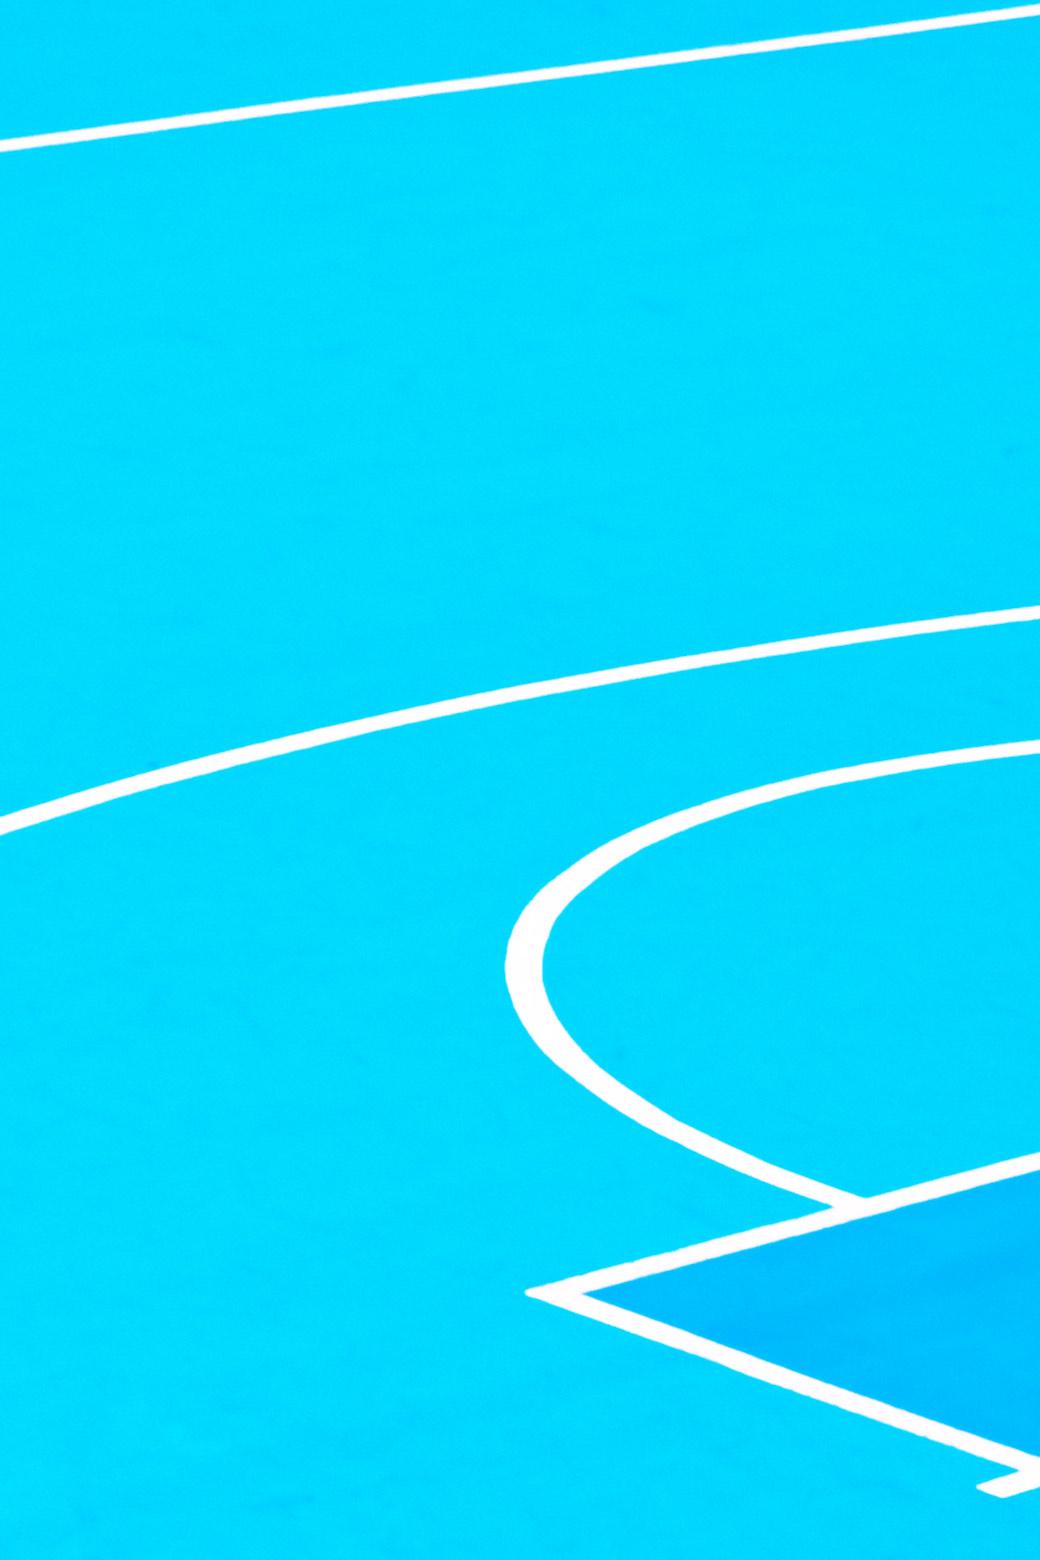 "<a href=""http://fabrizioraschetti.tumblr.com/"" target=""_blank"">Foto Fabrizio Raschetti</a>"